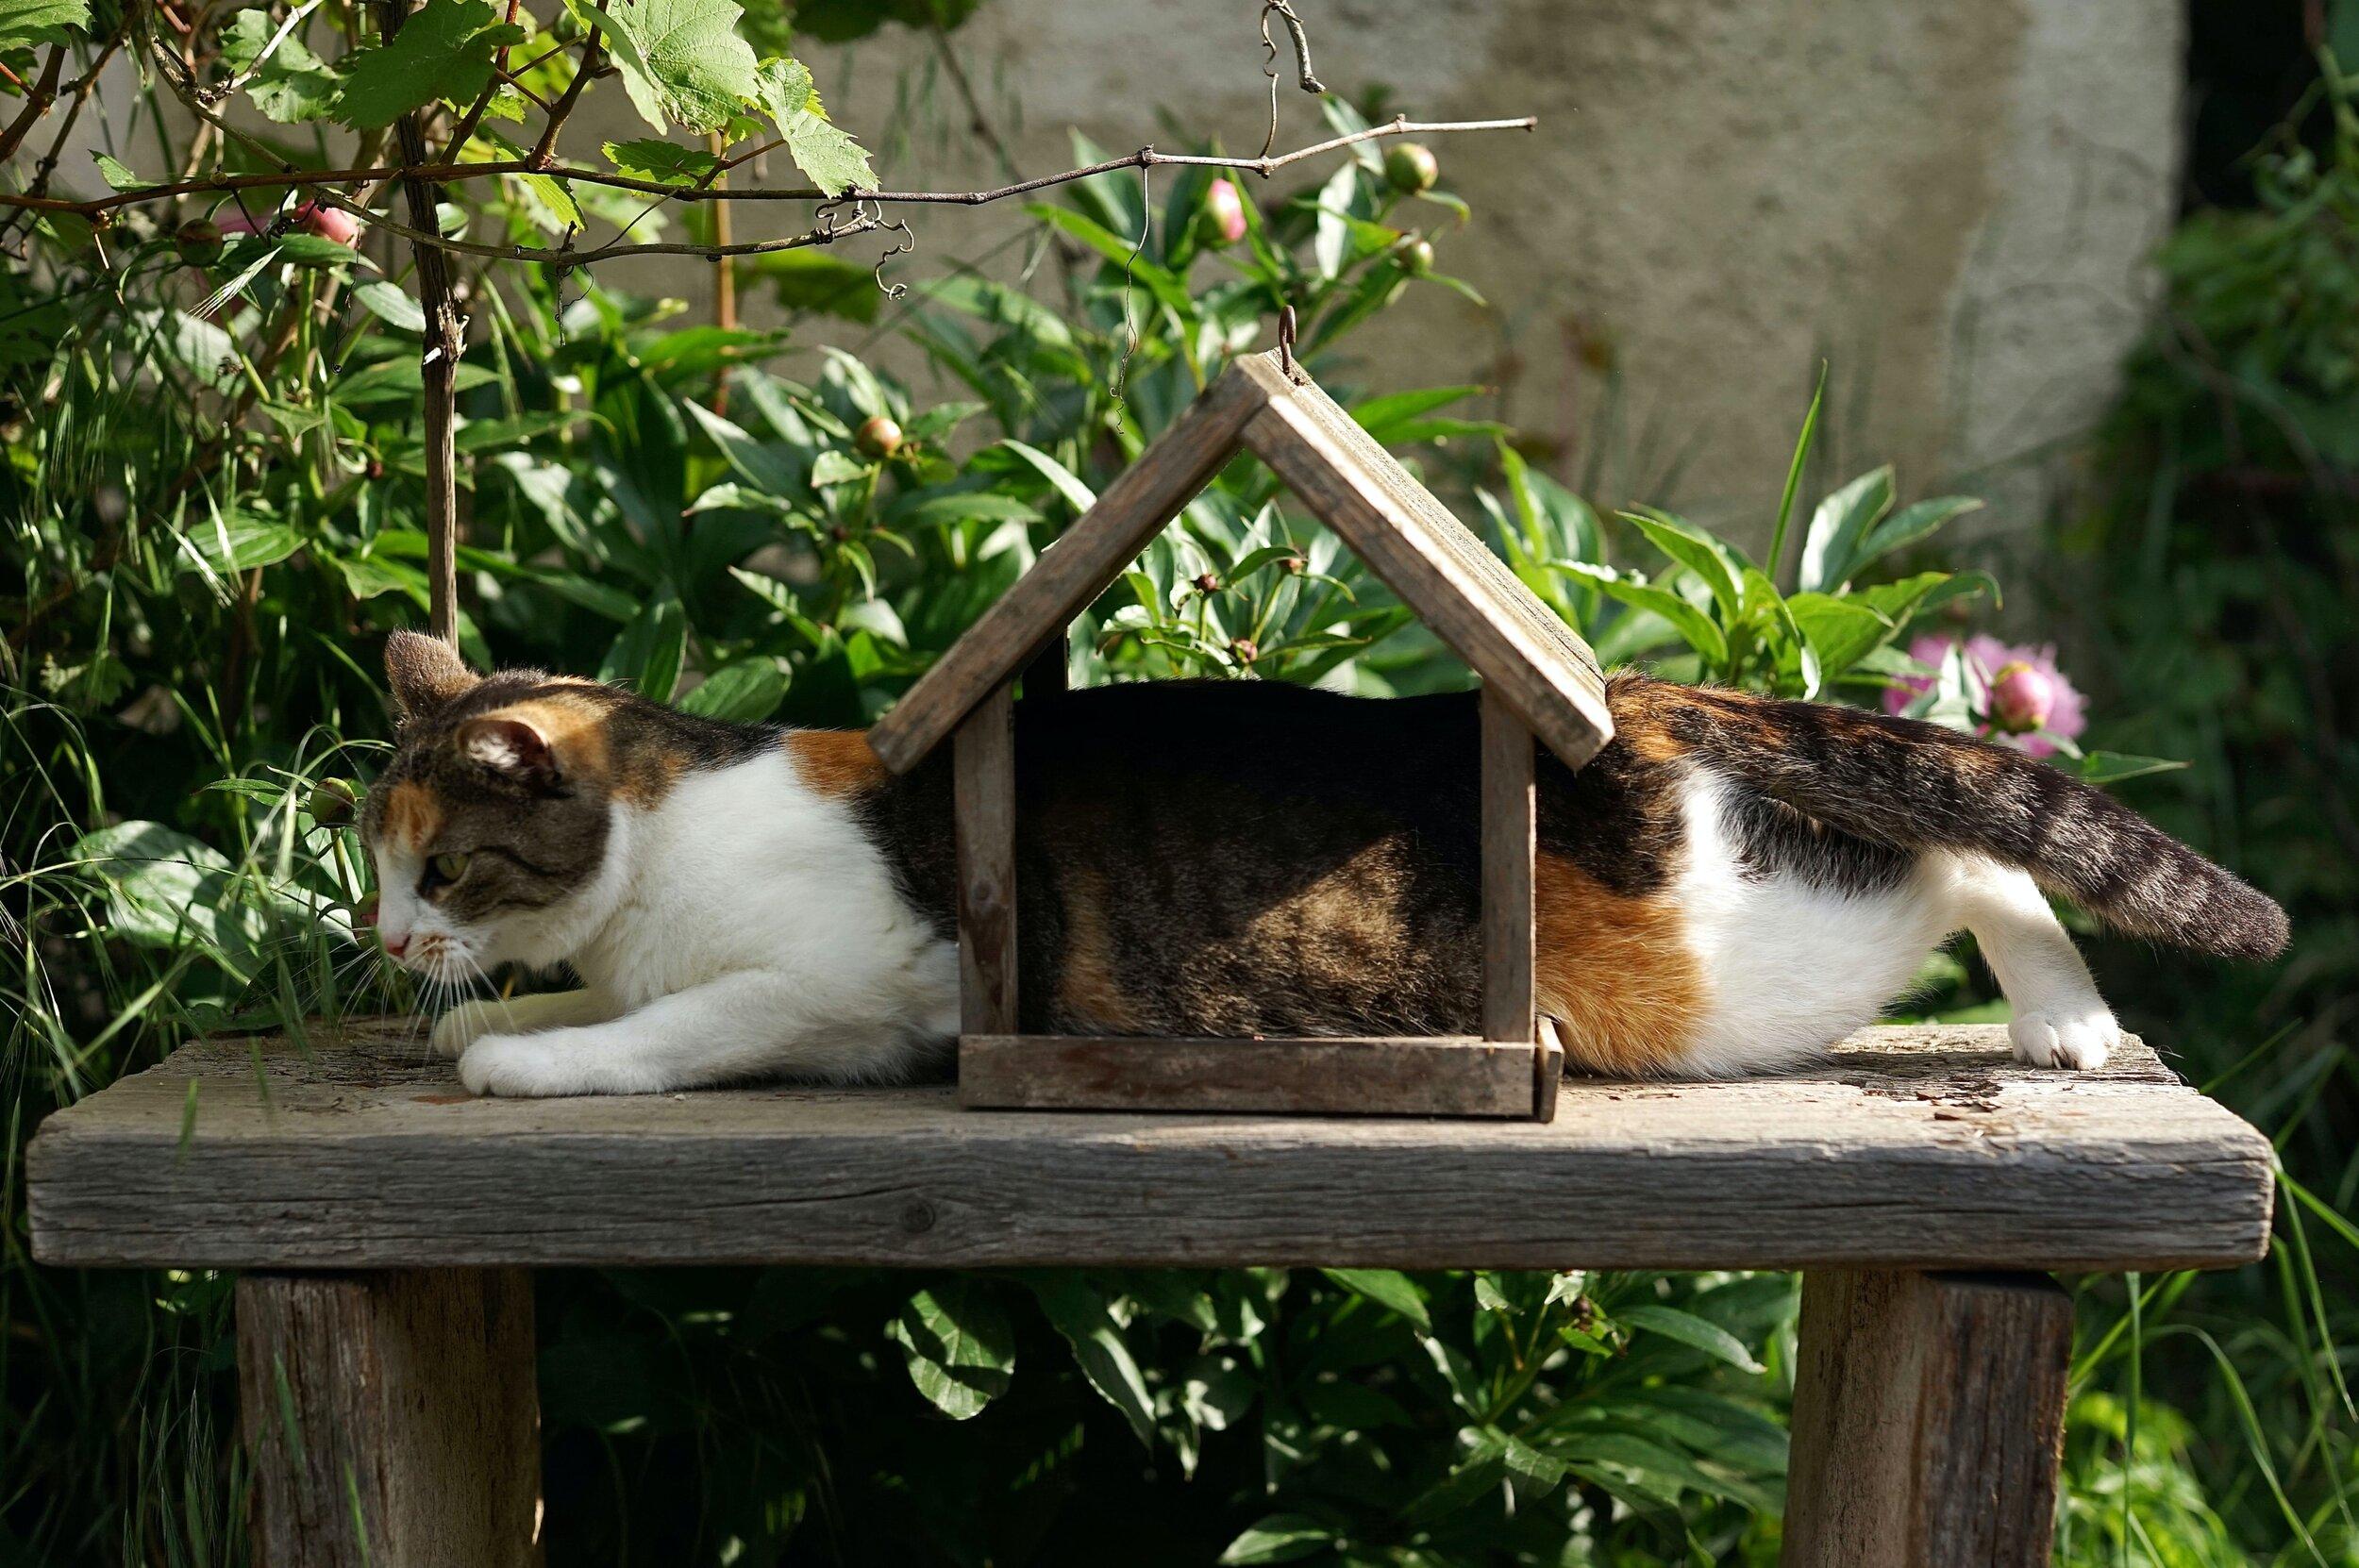 Amy Jean Blog - Petrichor? No, Stuck Poem - Cat stuck in bird feeder